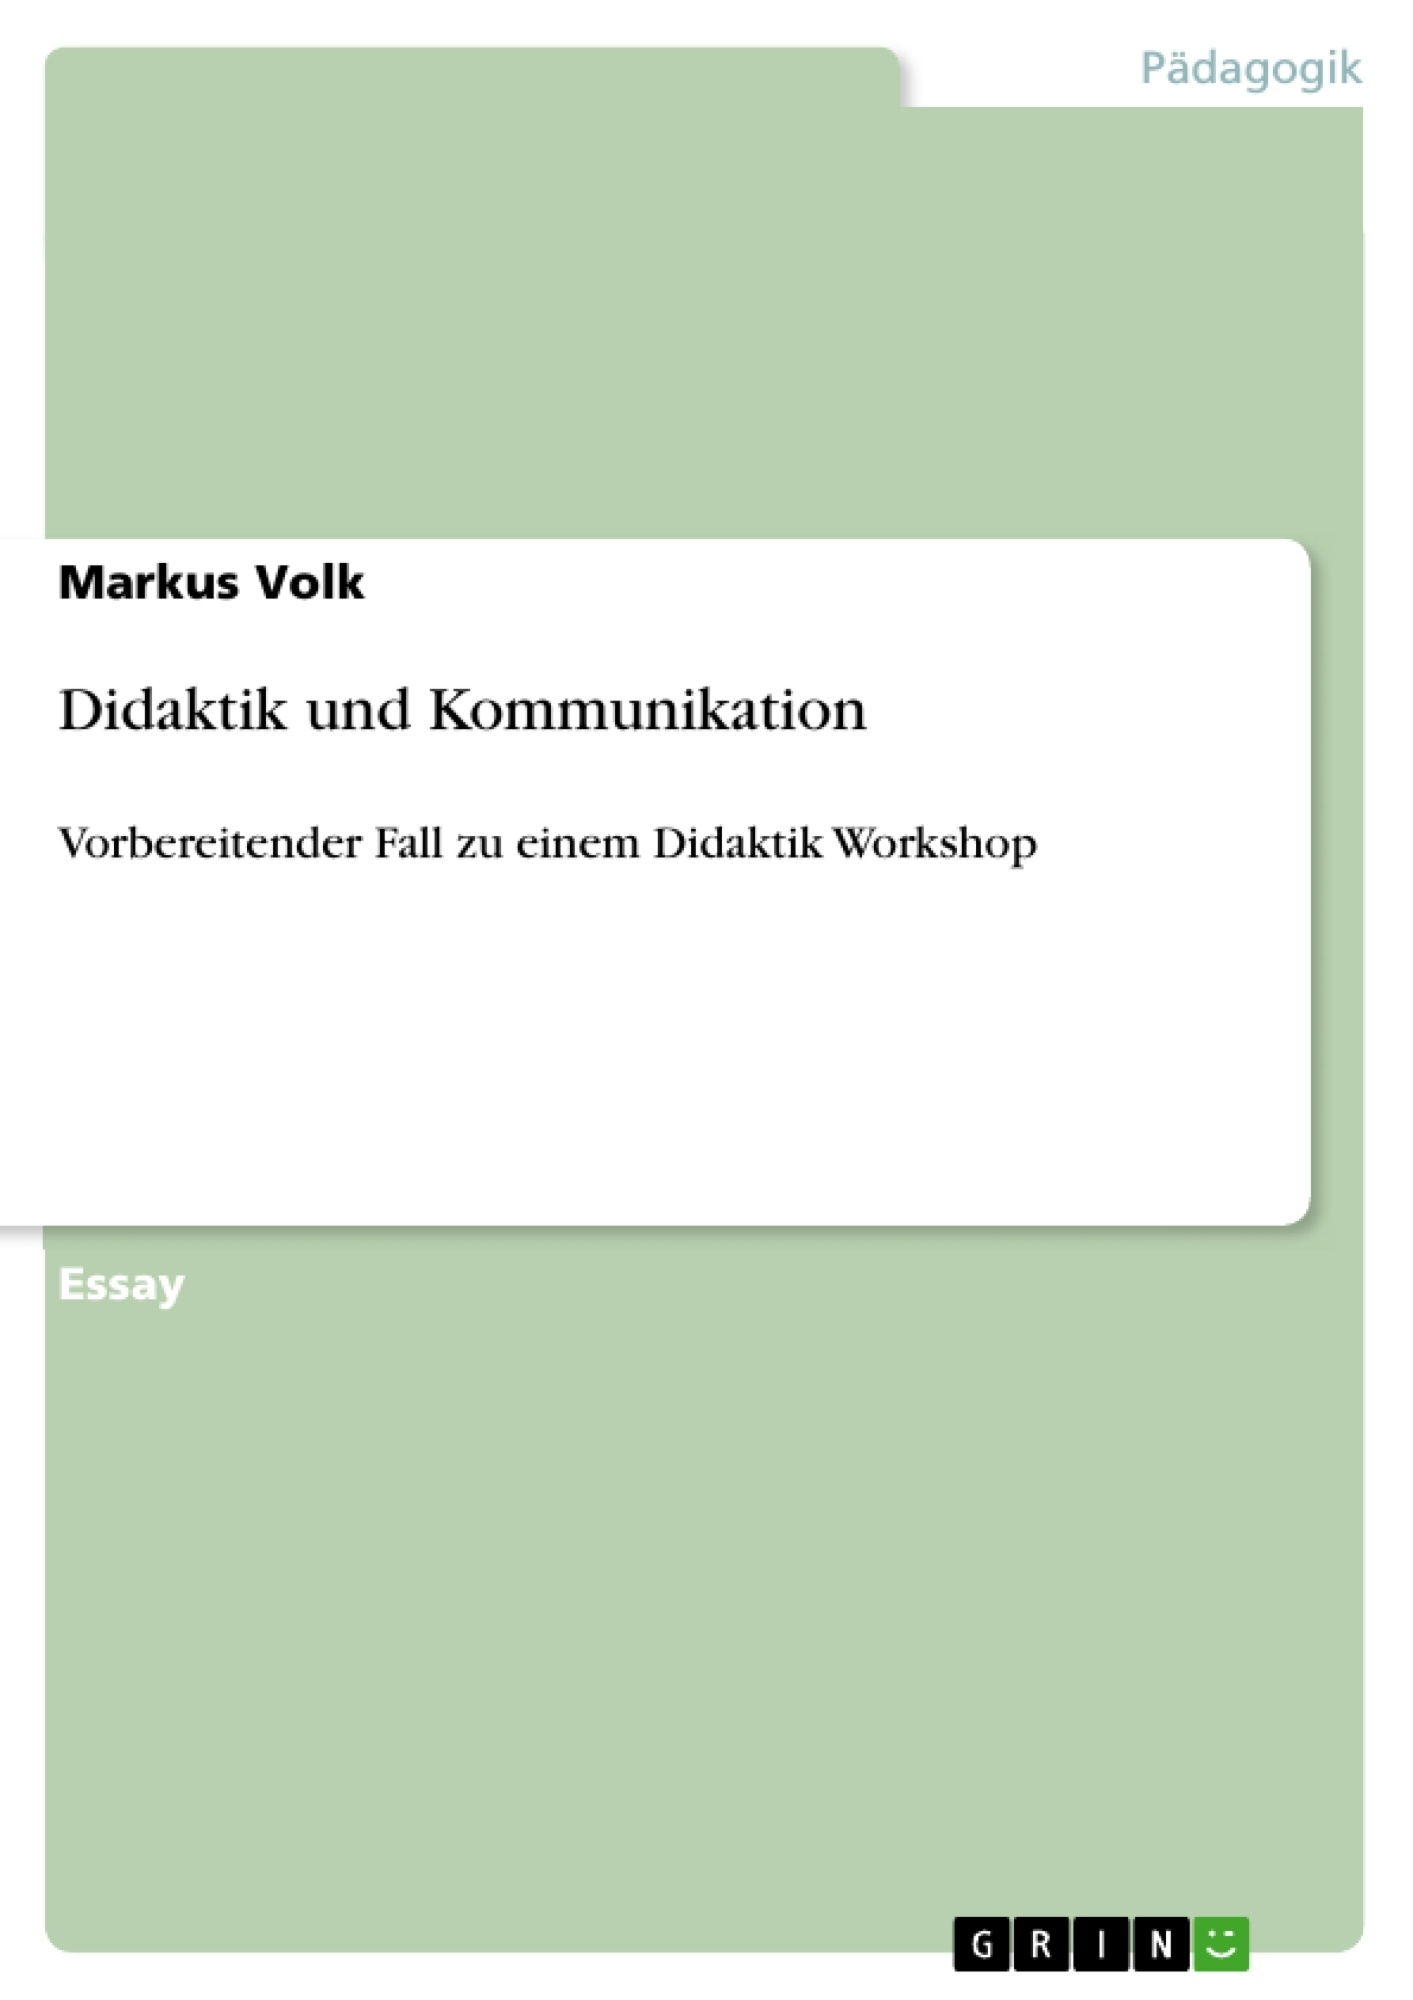 Titel: Didaktik und Kommunikation